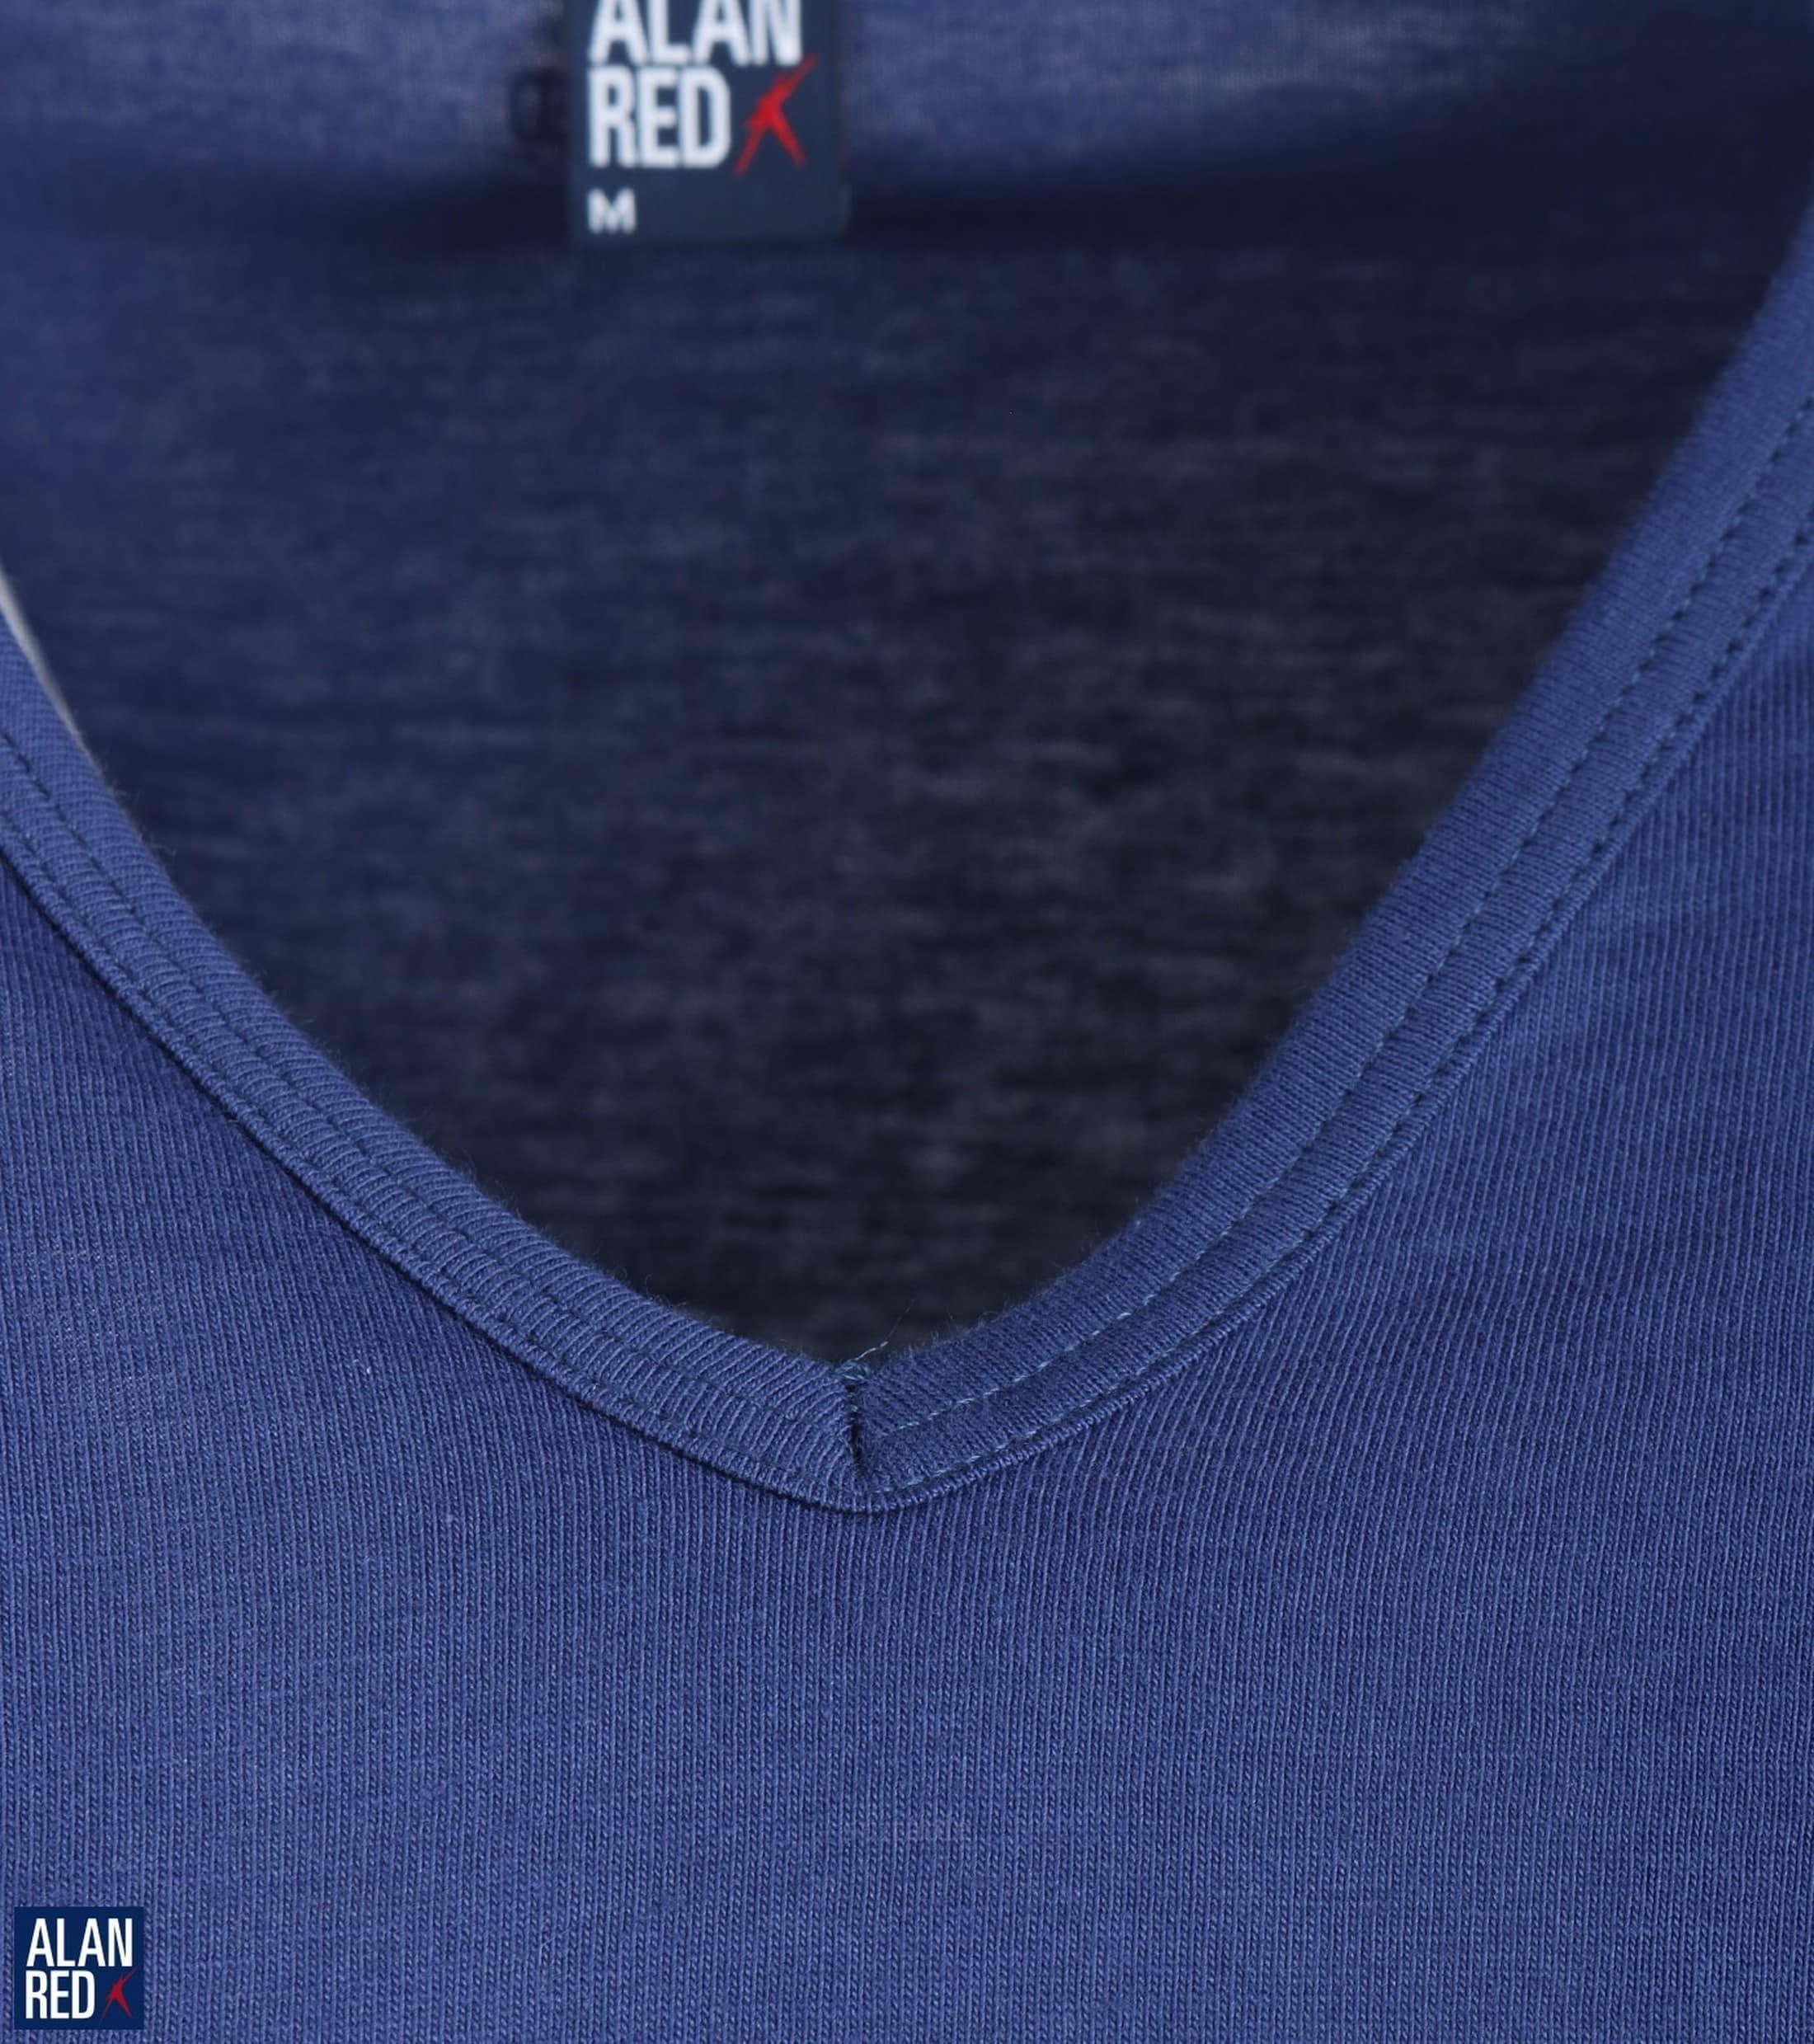 Alan Red Vermont T-shirt V-Neck Ultramarine 1-Pack foto 1